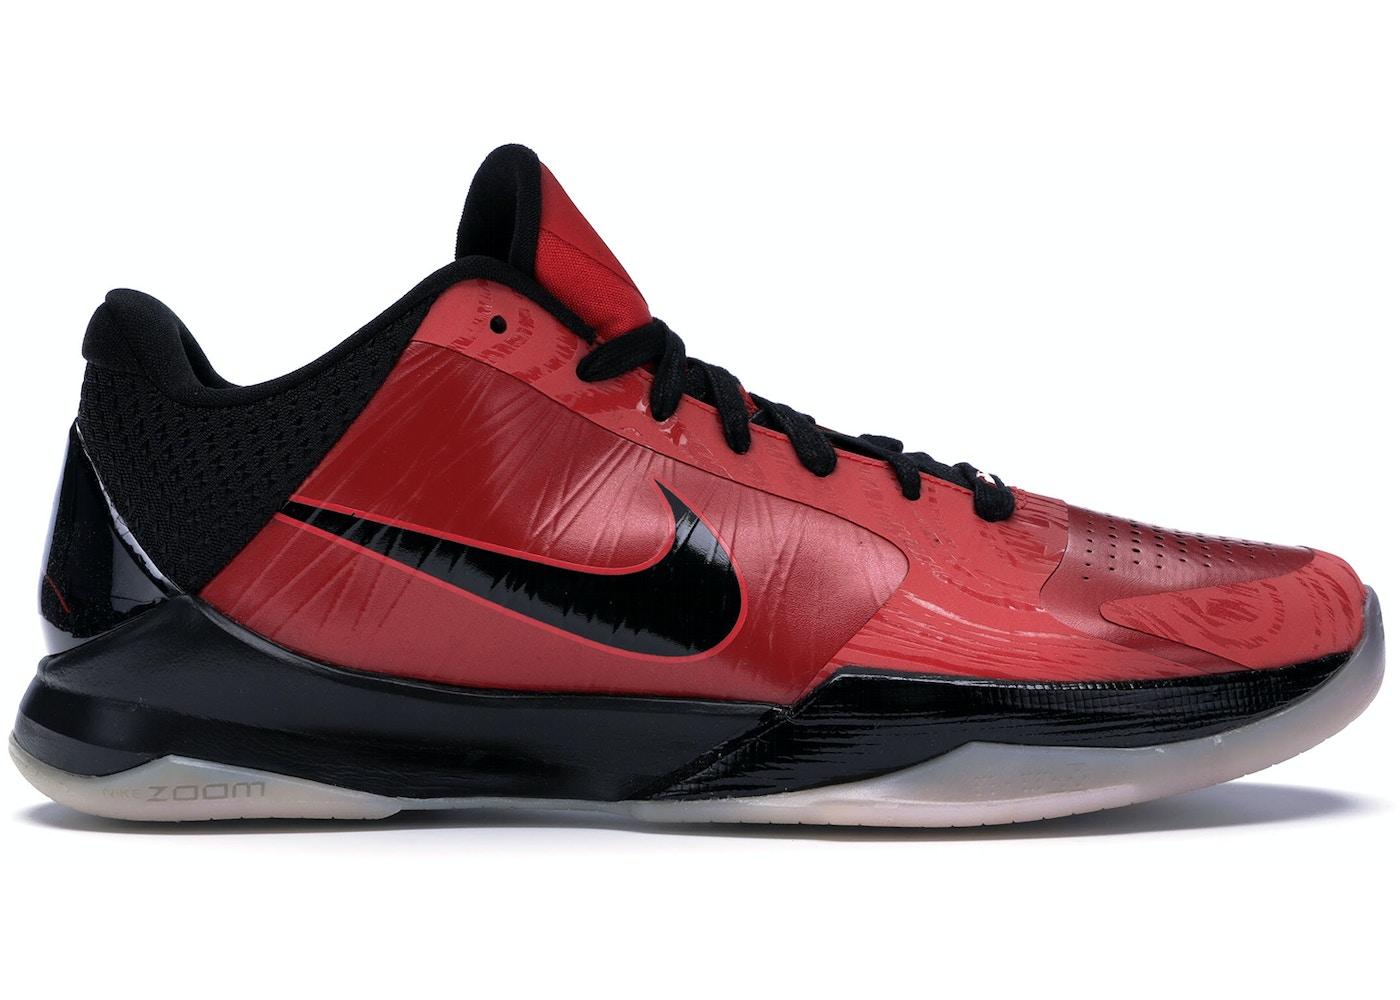 huge discount fe349 41f8b Nike Kobe 5 Shoes - Most Popular